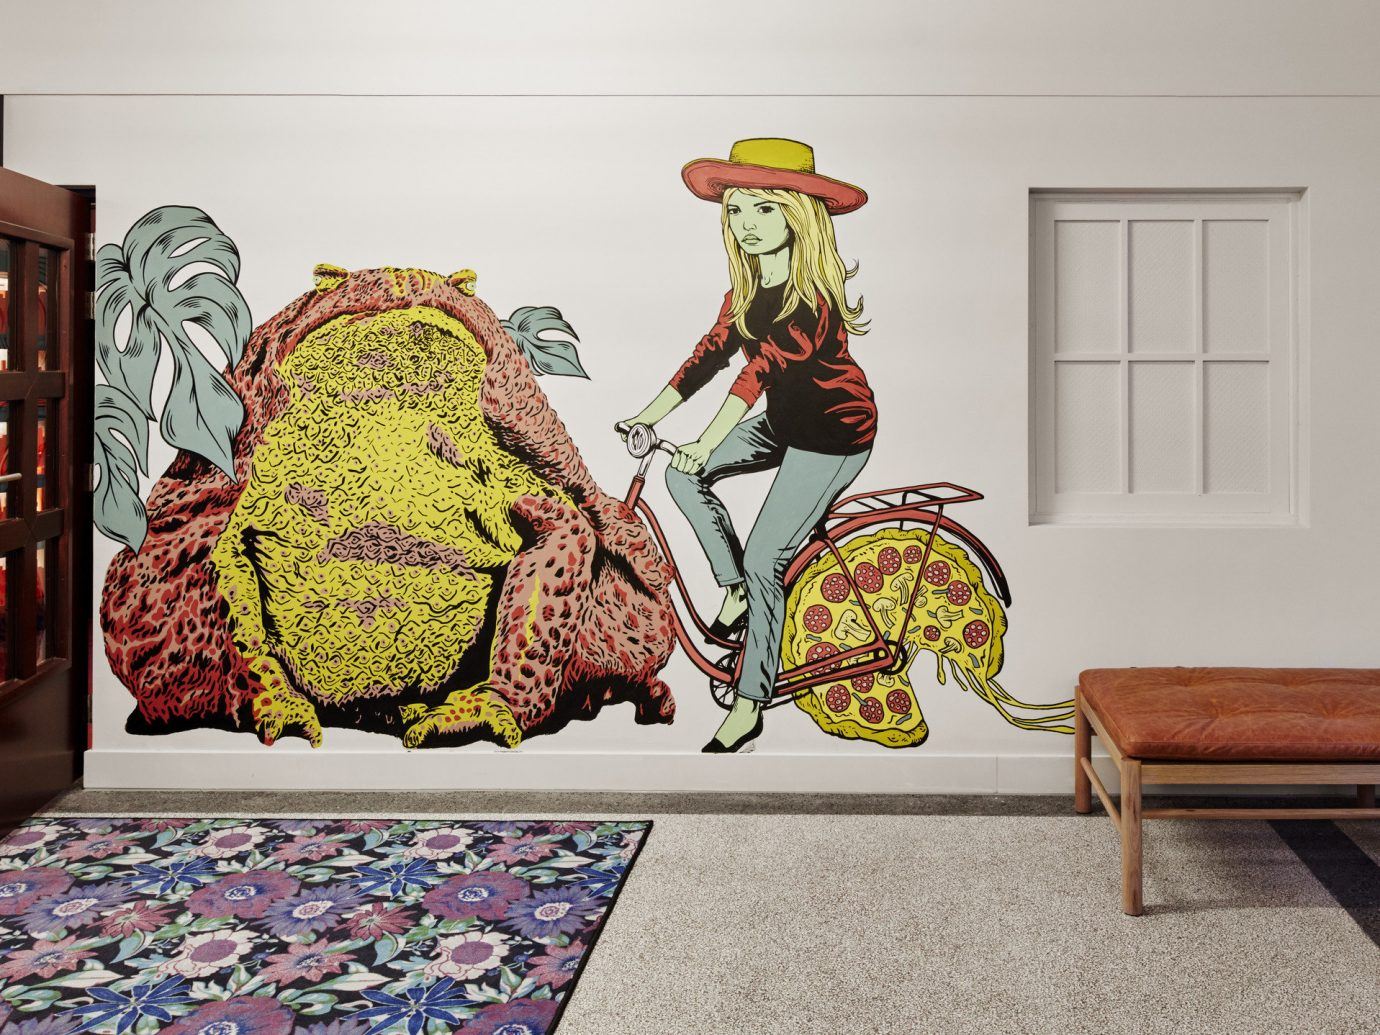 Hotels indoor floor Living art painting modern art mural furniture Design illustration textile